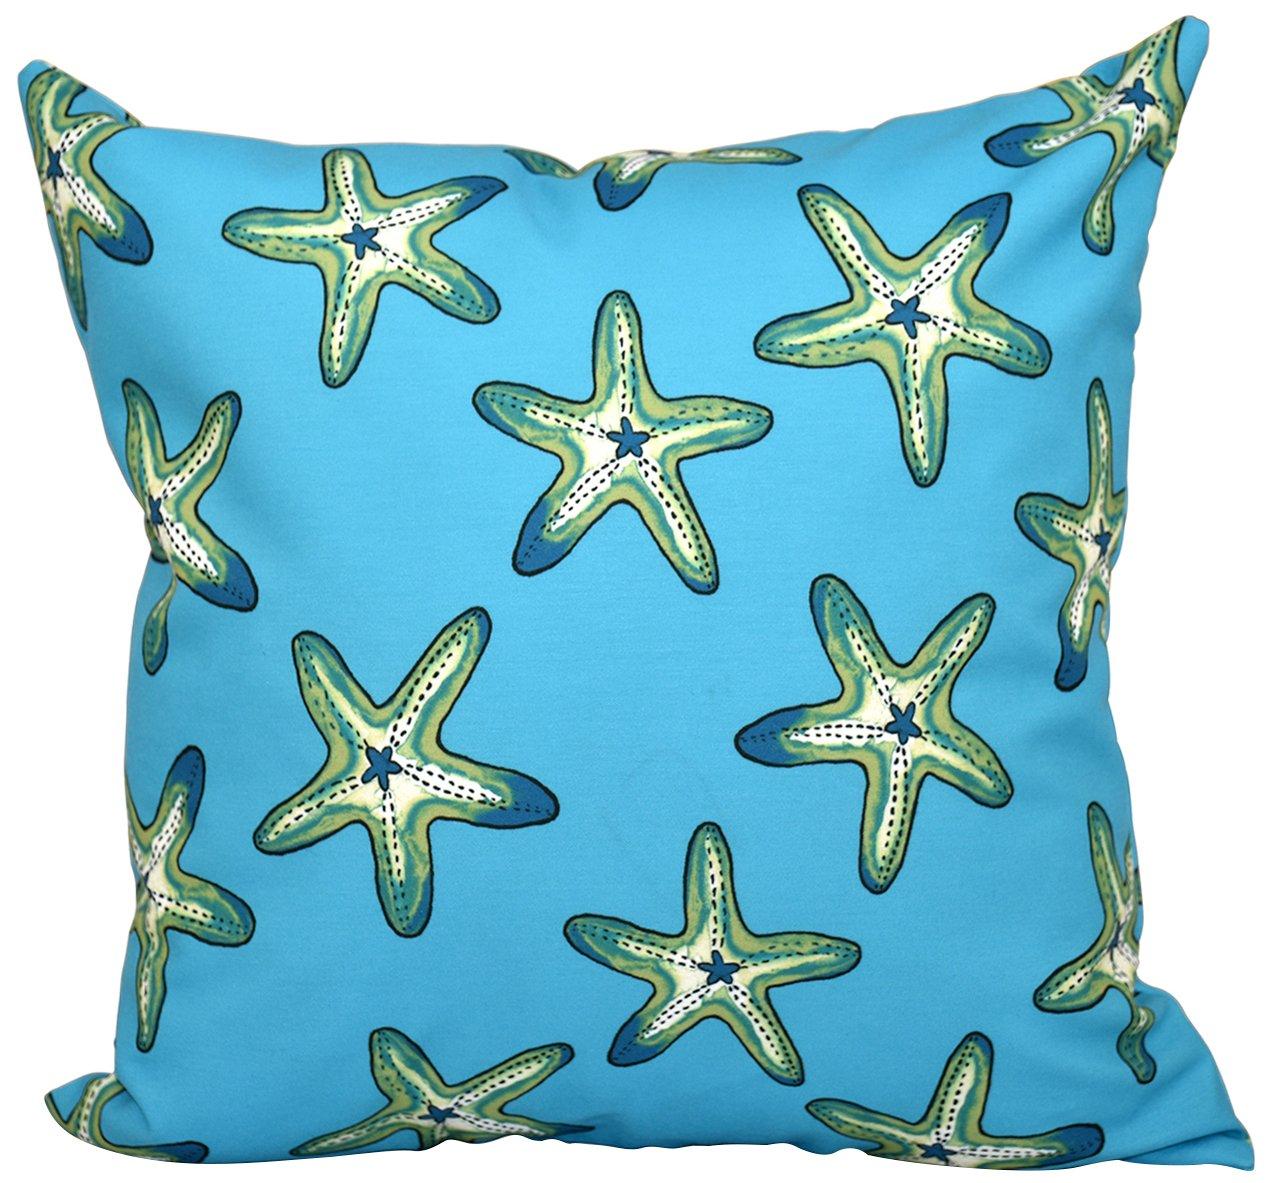 E by design PGN474BL27GR17-26 26 x 26 inch Geometric Print 26x26 Blue Soft Starfish